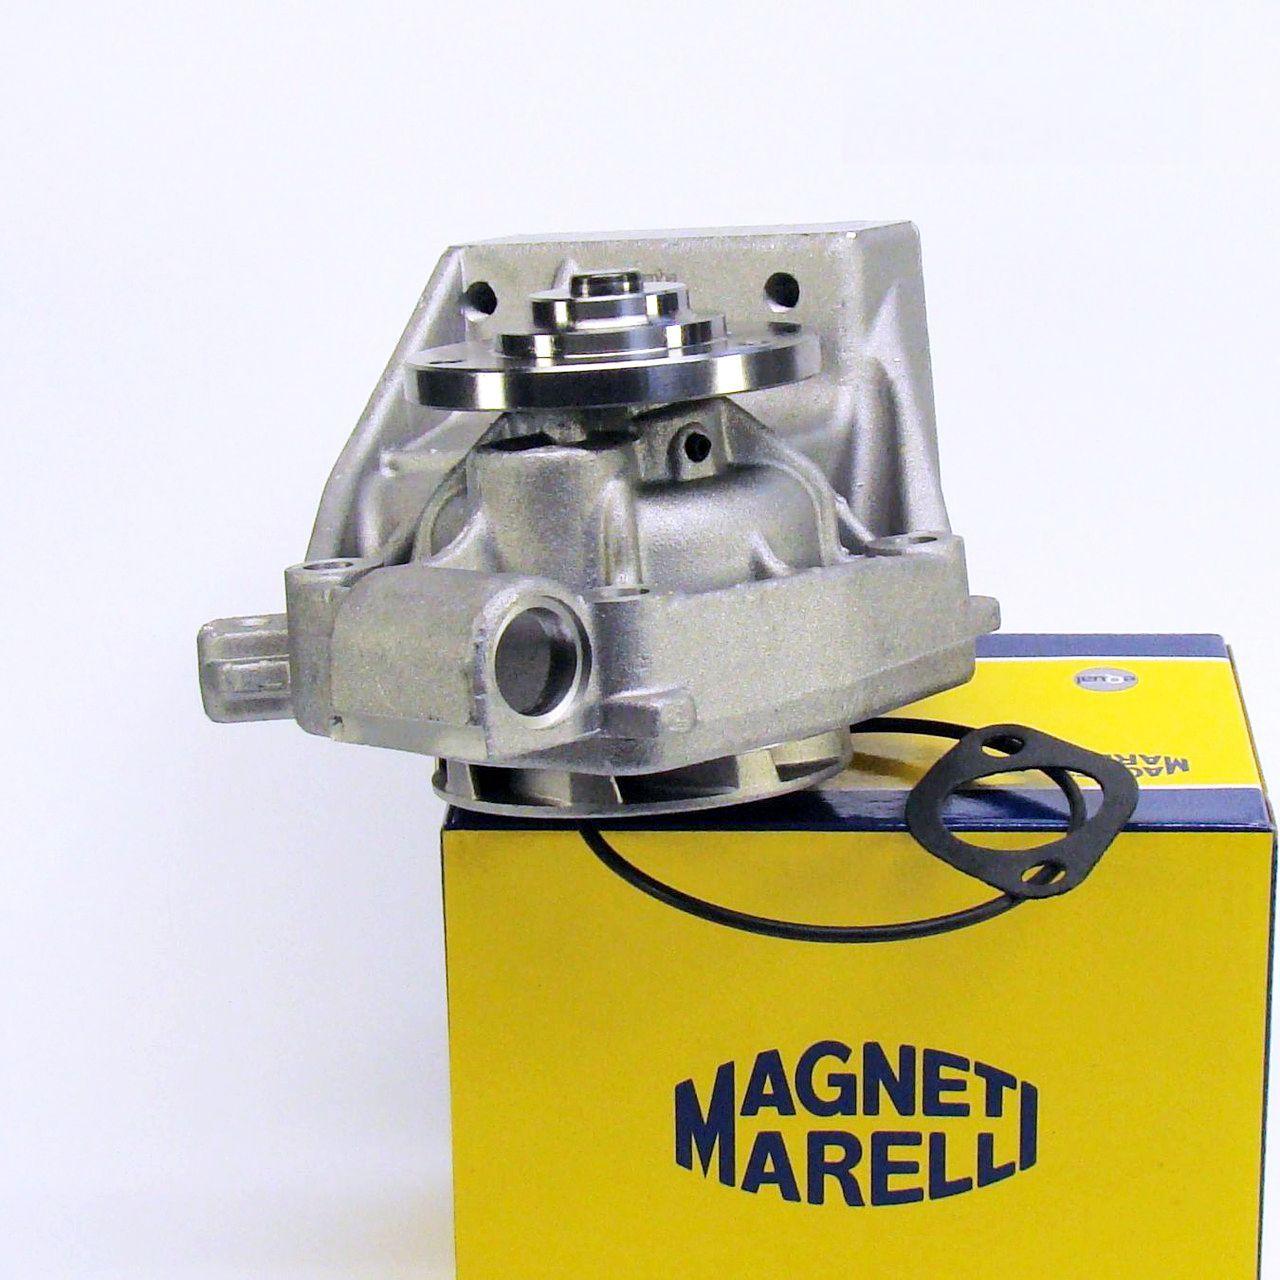 MAGNETI MARELLI Wasserpumpe 352316170909 für FIAT DUCATO Bus Panorama 2.5 4x4